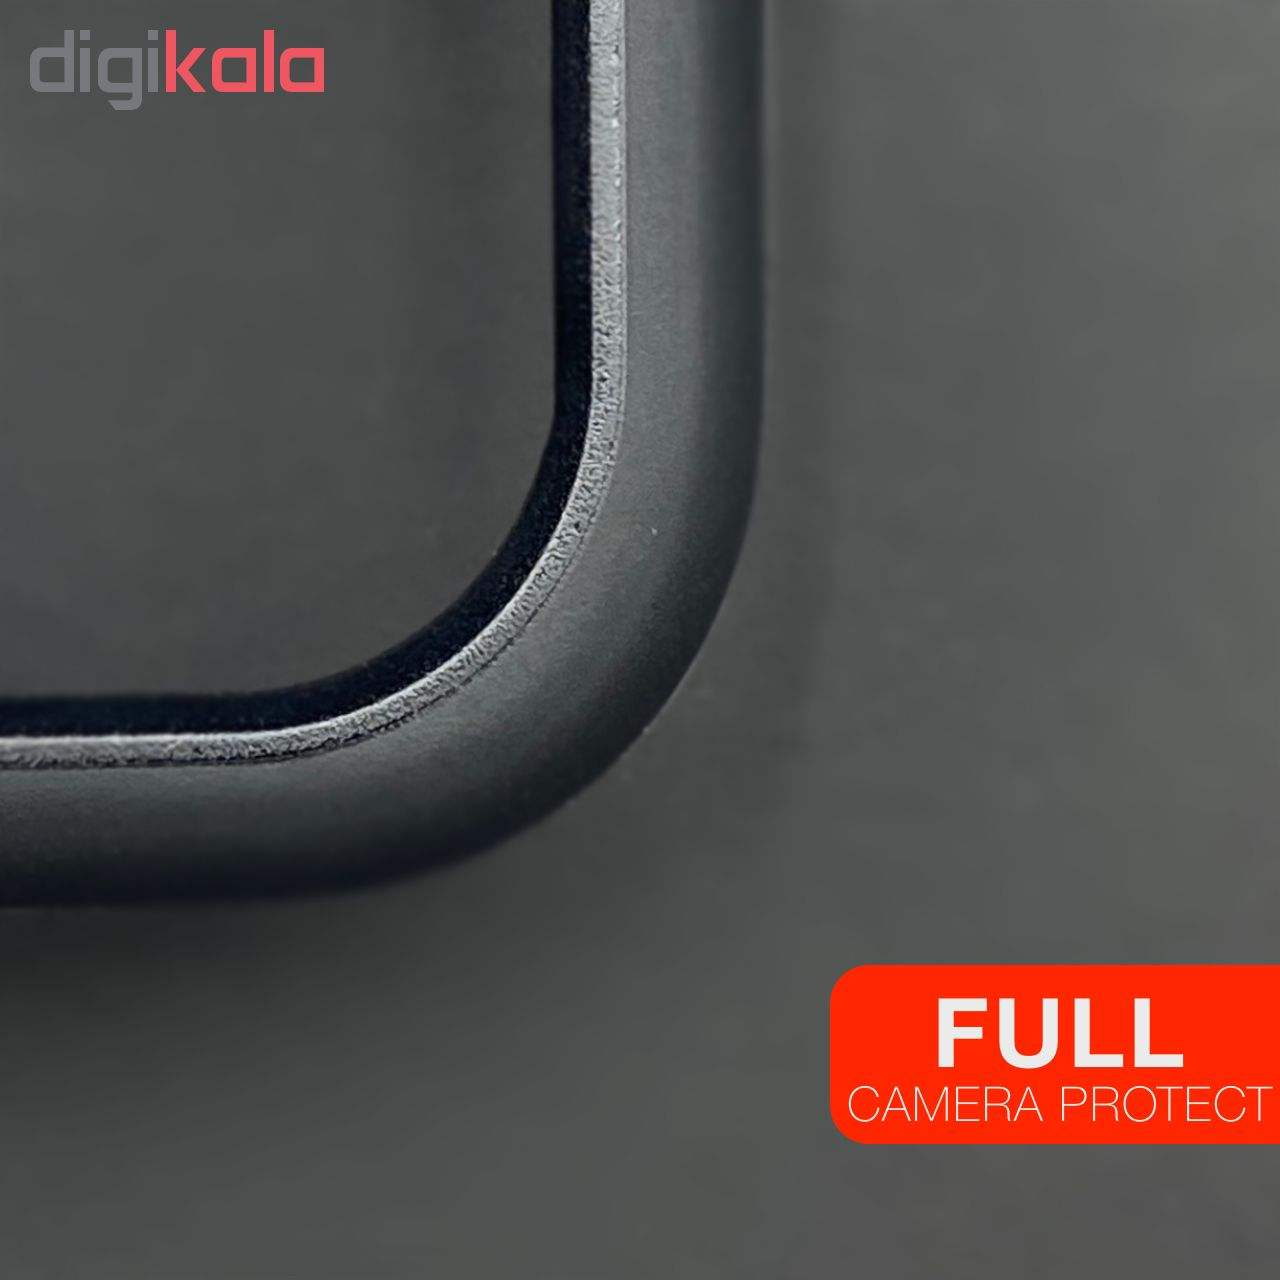 کاور آکام مدل AN91766 مناسب برای گوشی موبایل سامسونگ Galaxy Note 9 main 1 6